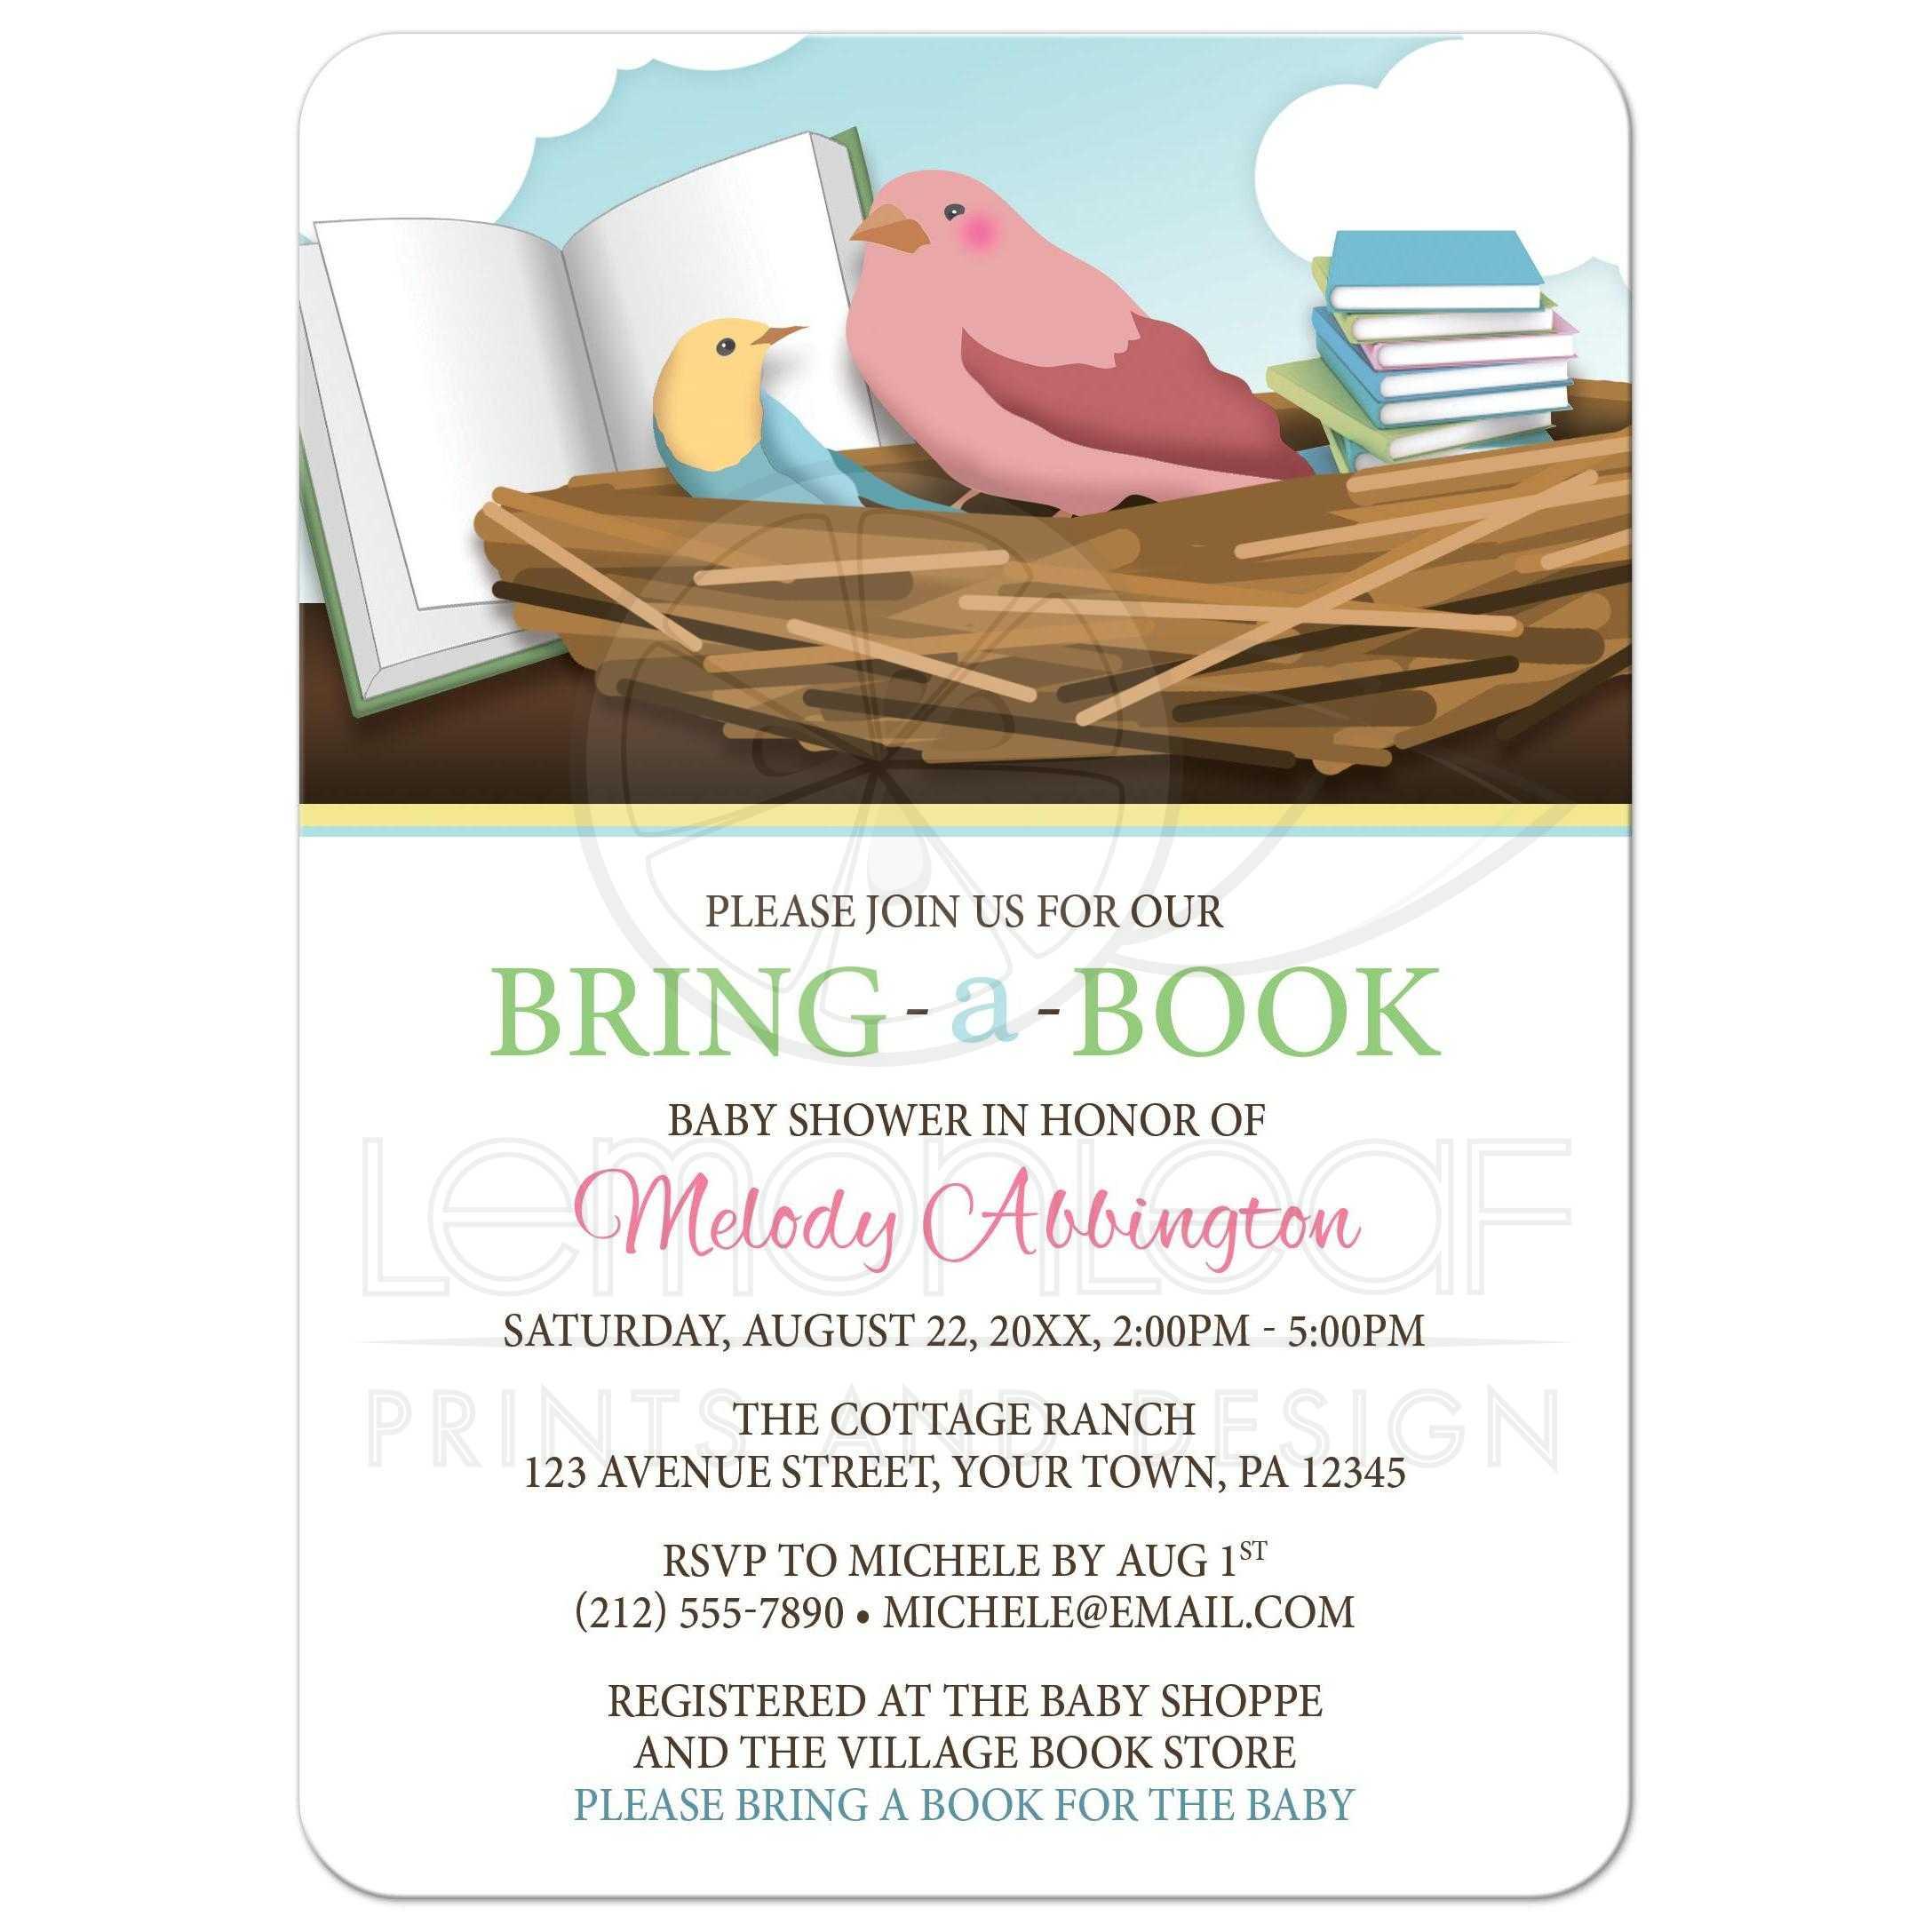 Baby Shower Invitations - Bird Nest Bring a Book